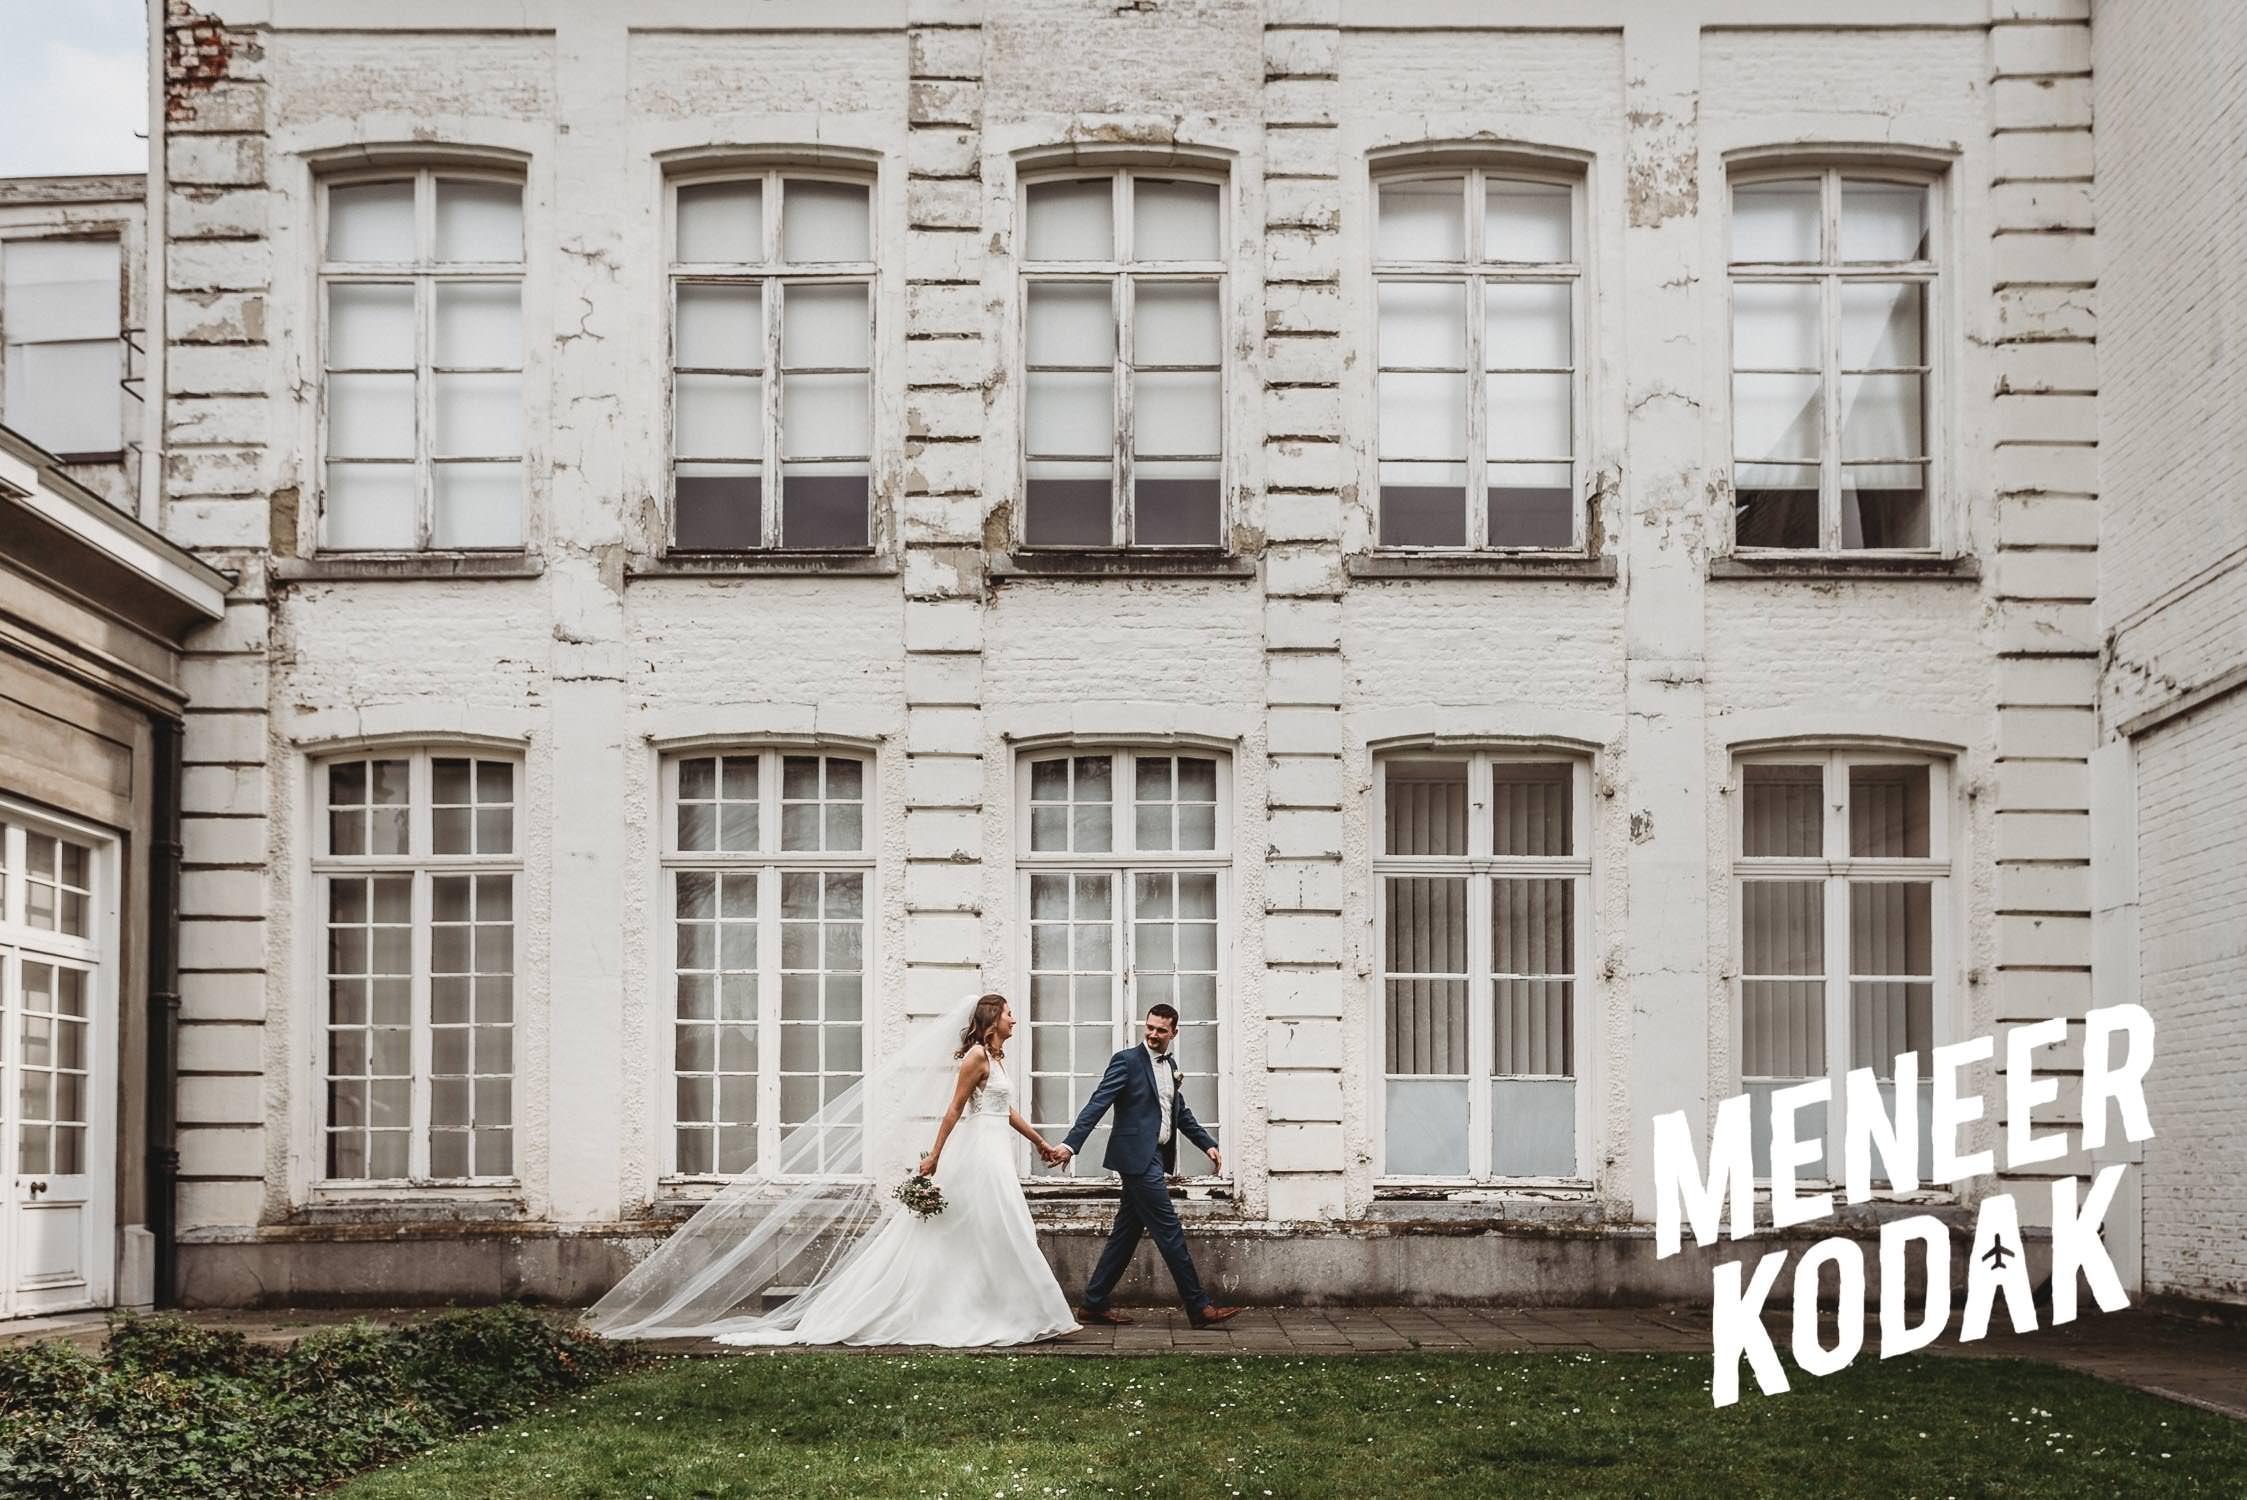 Meneer Kodak - Bruidsfotograaf - Aalst - E&L-065.jpg